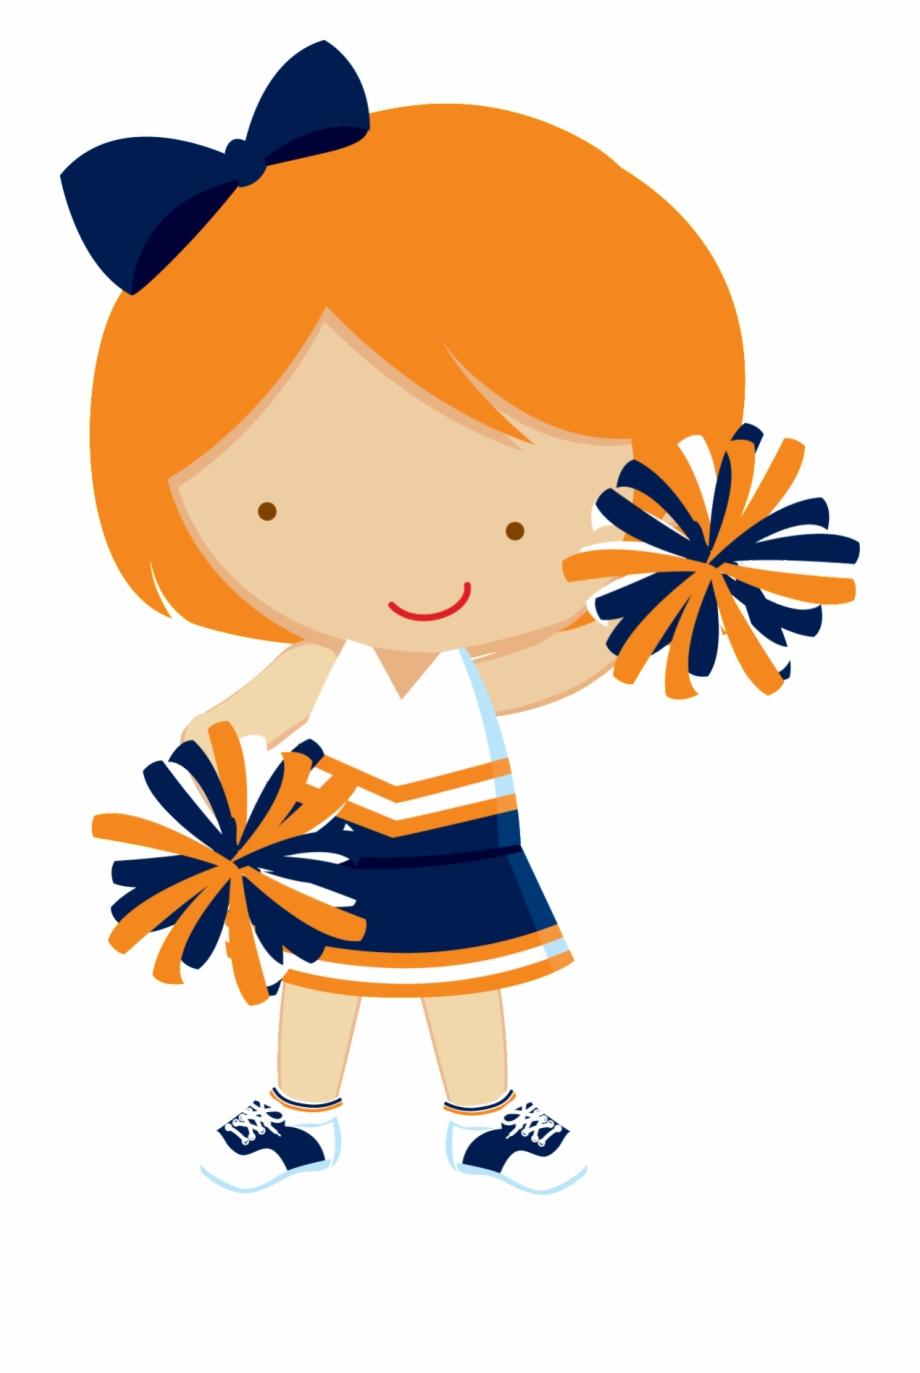 Cheer clipart clipart library Cheerleader Clipart - Cheerleader Cute Clipart Free PNG Images ... library